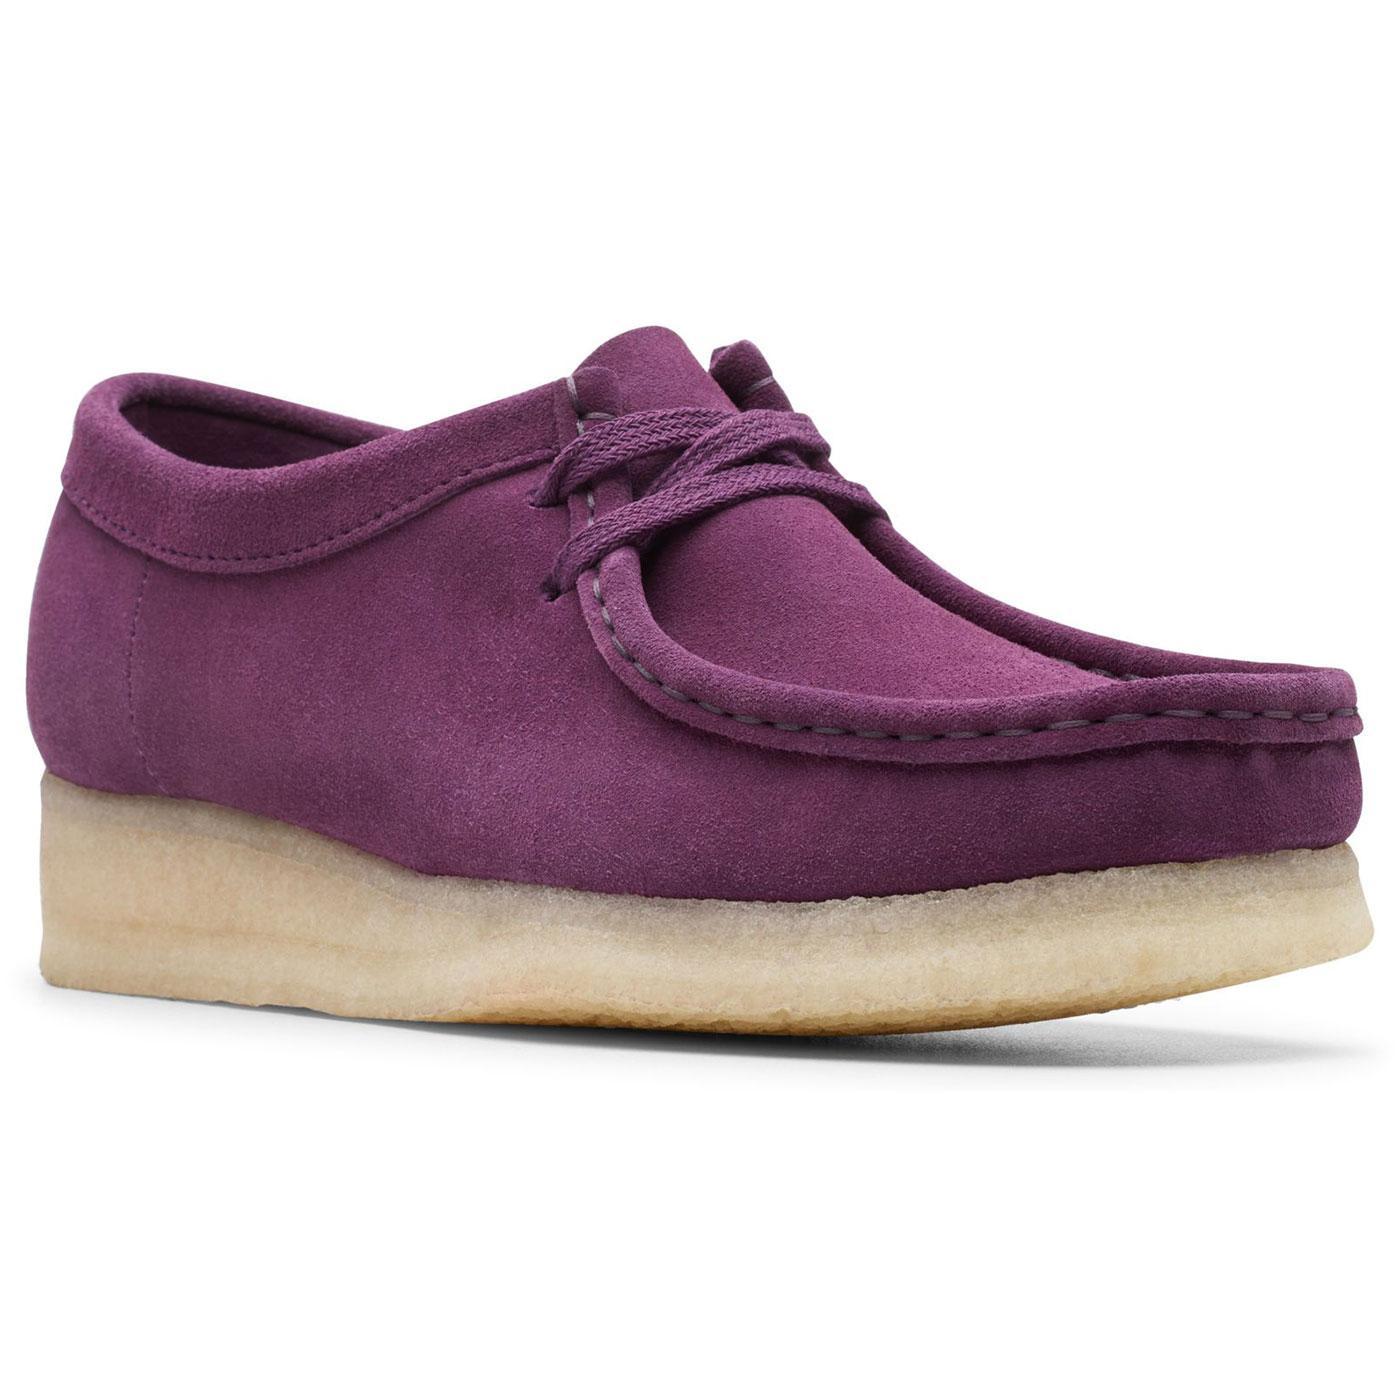 Wallabee CLARKS ORIGINALS 60s Mod Suede Shoes DP